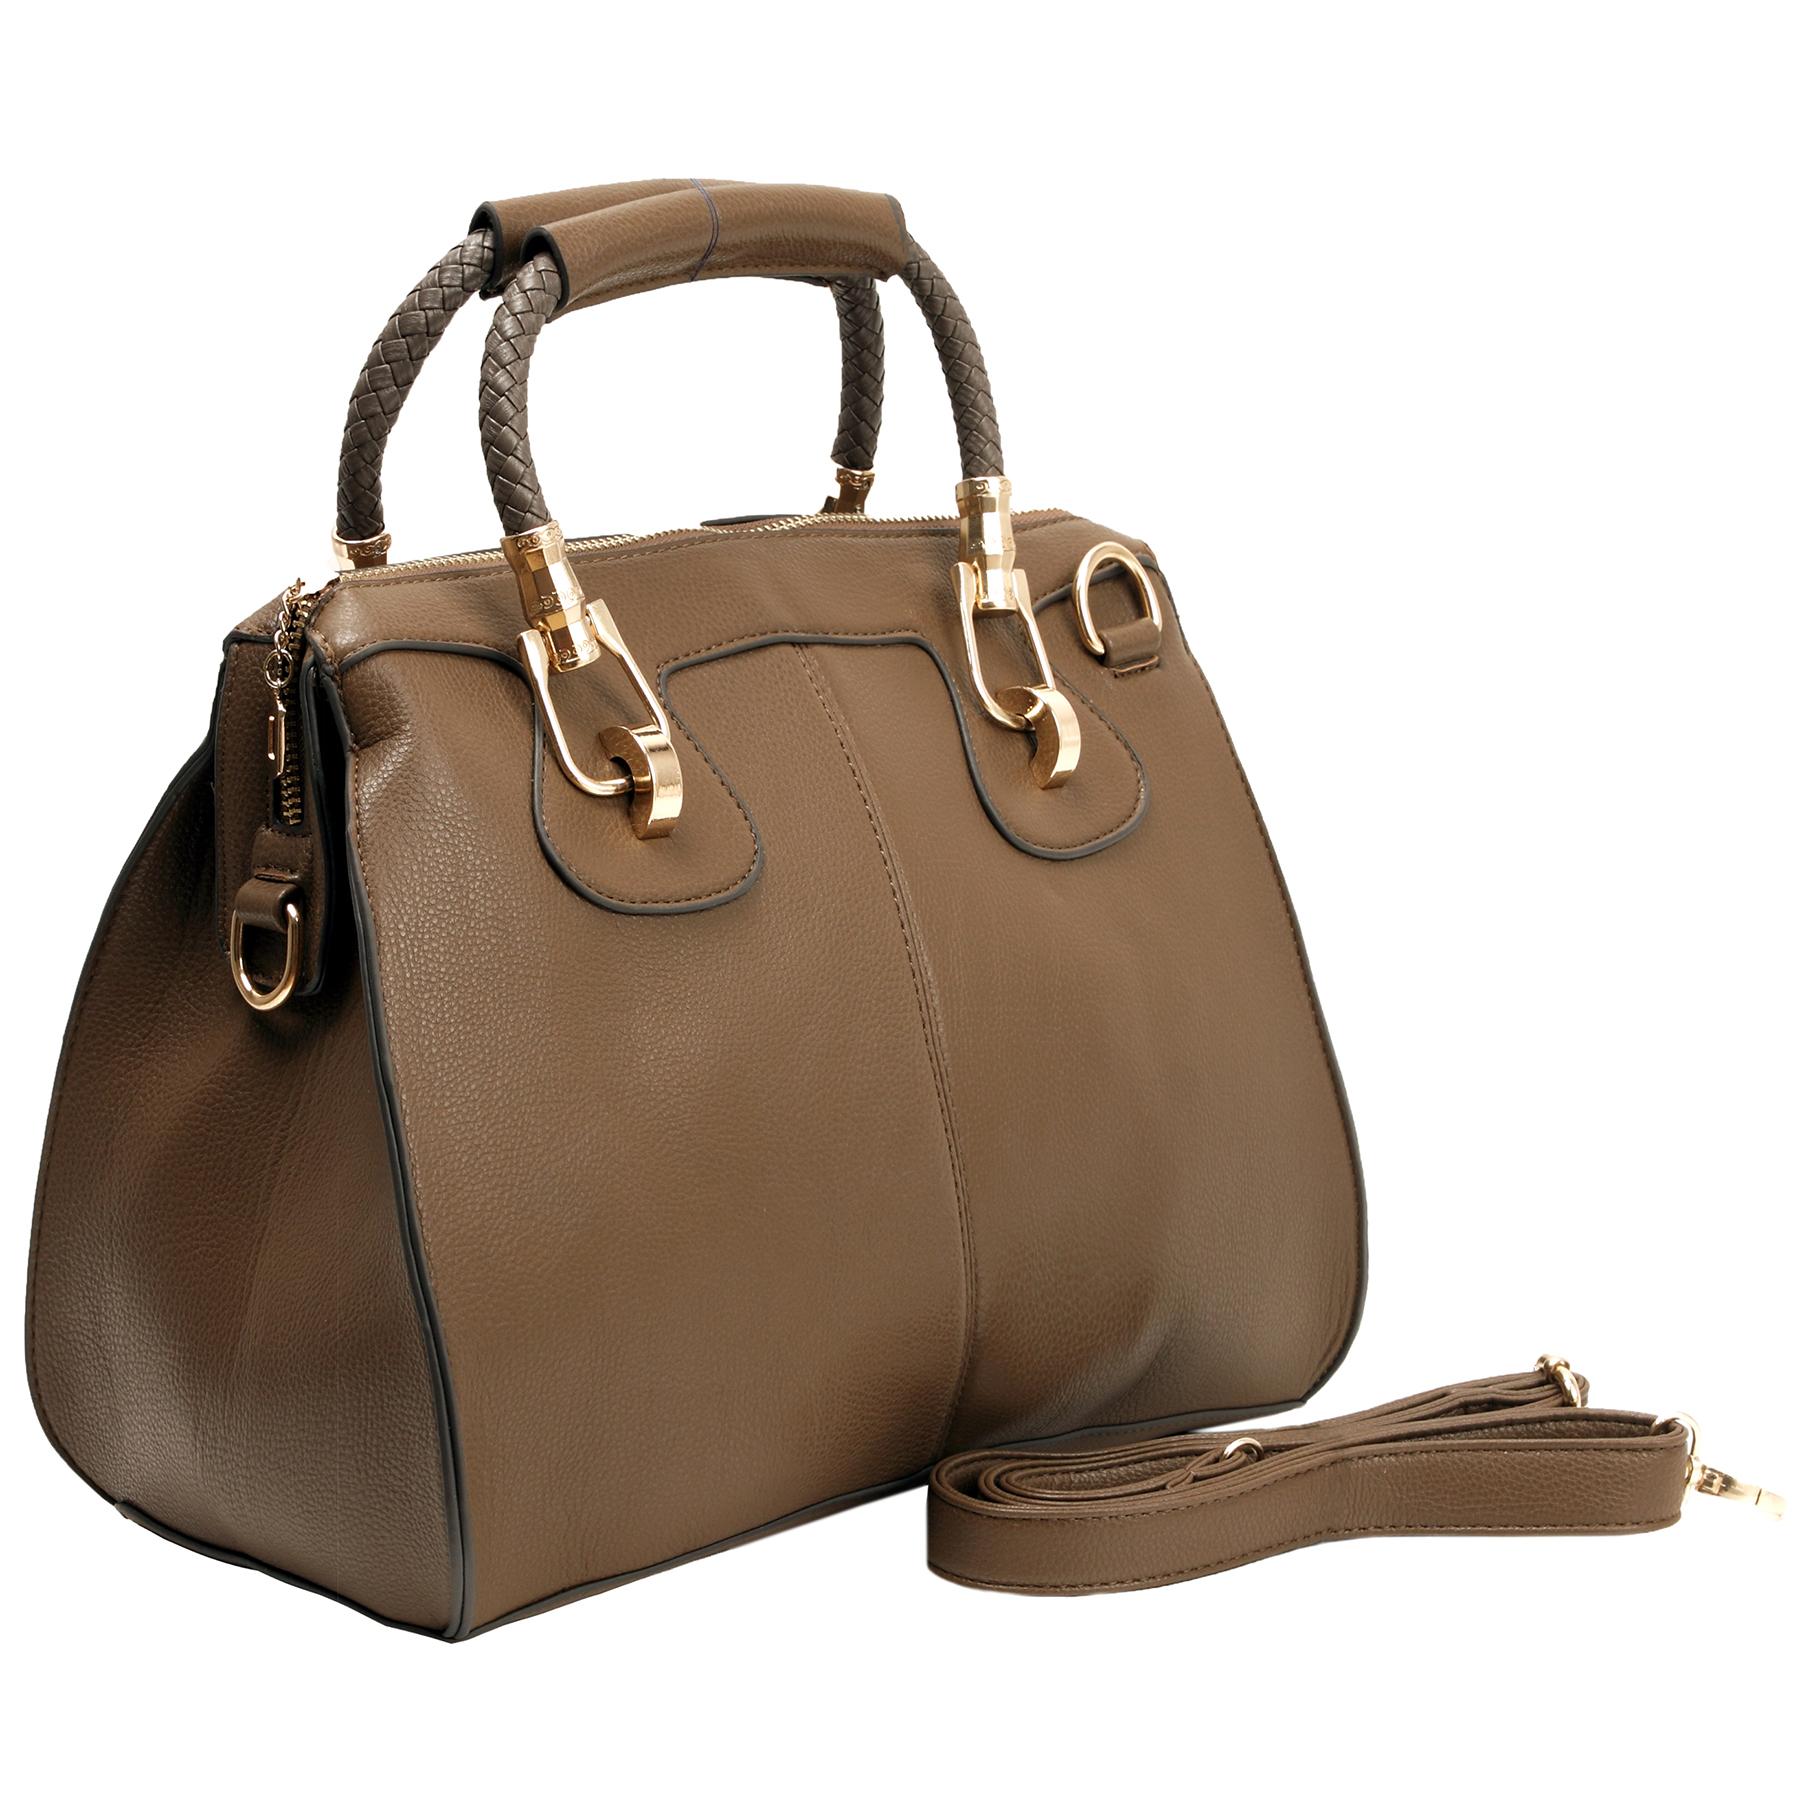 MARISSA Taupe Doctor Style Handbag Main